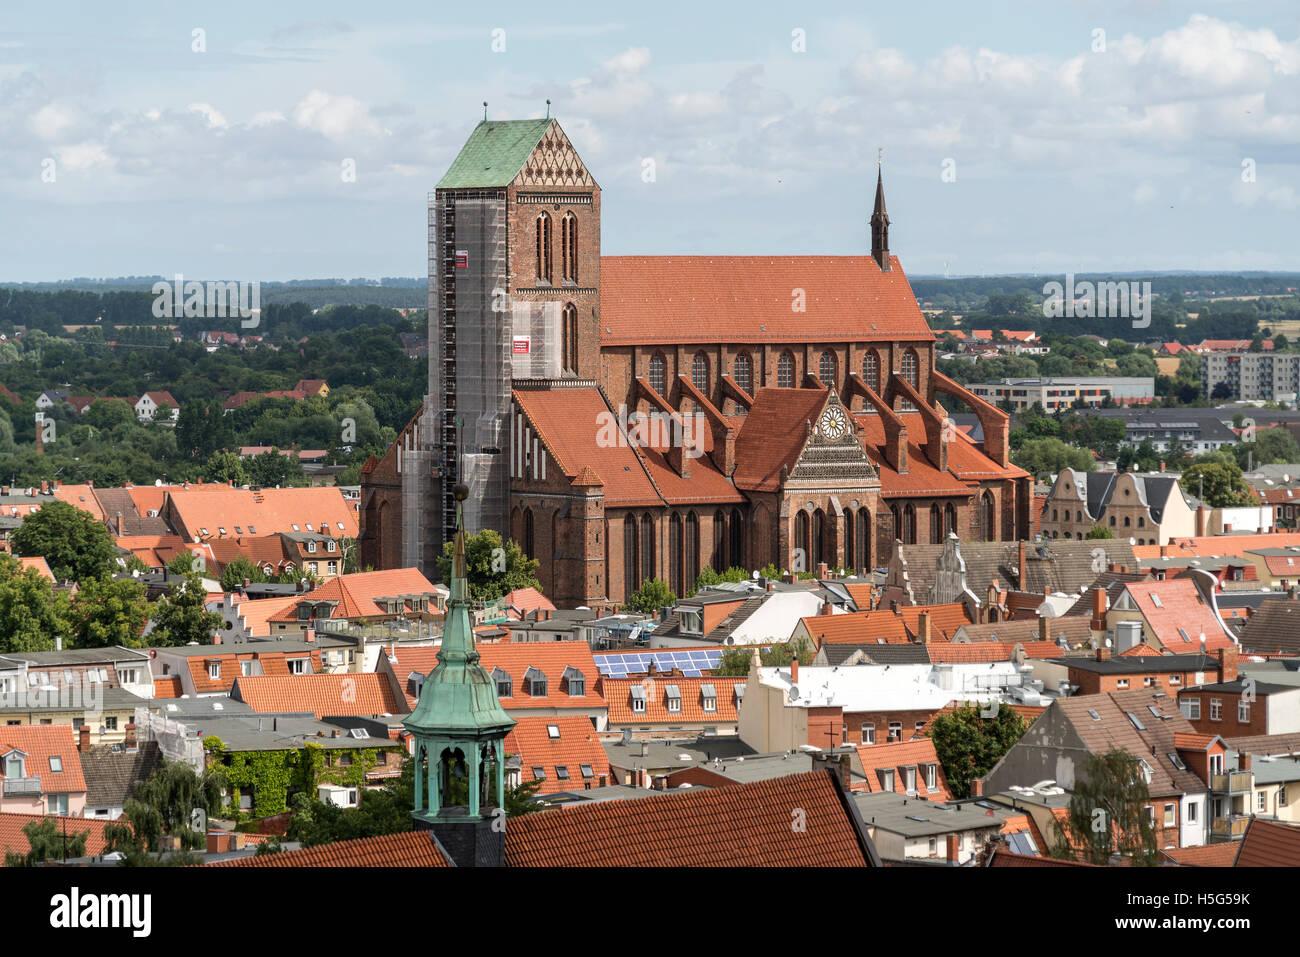 Church St. Nicholas, Hanseatic City of Wismar, Mecklenburg-Vorpommern, Germany - Stock Image